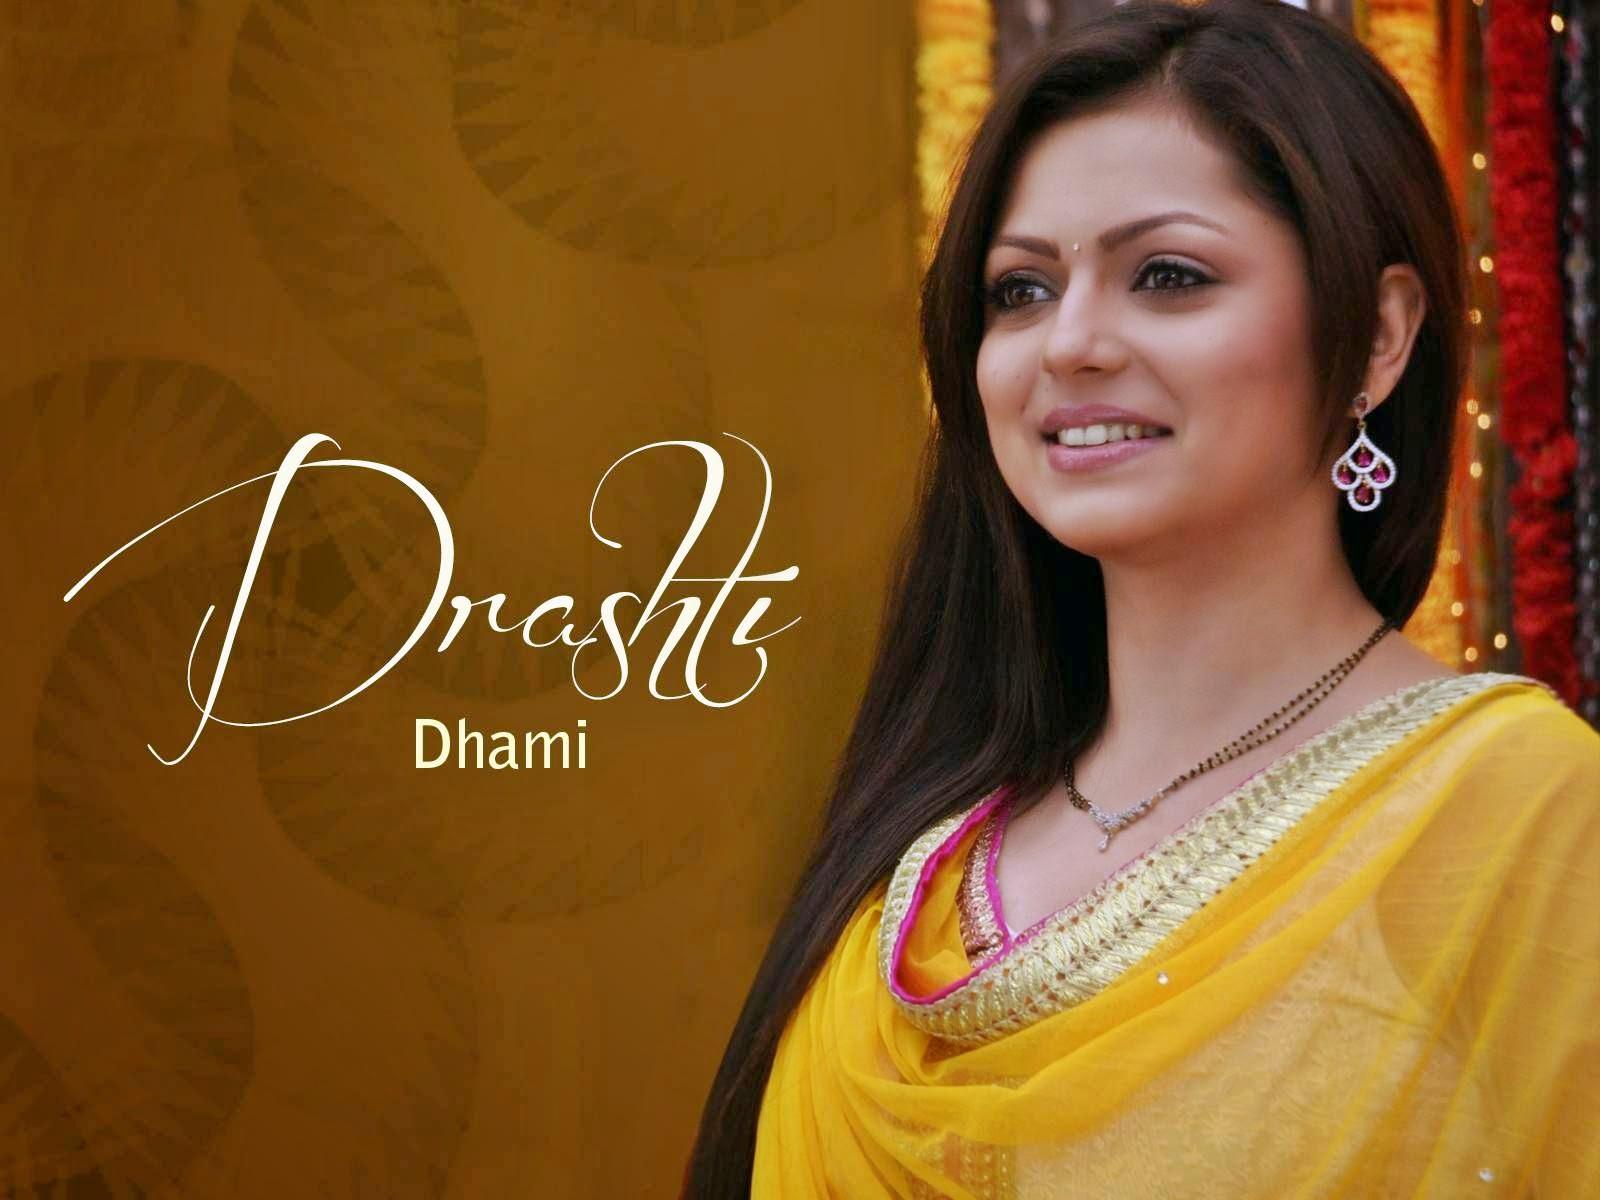 Hindi serial actor wallpaper / Youtube ccc 2 episode 8